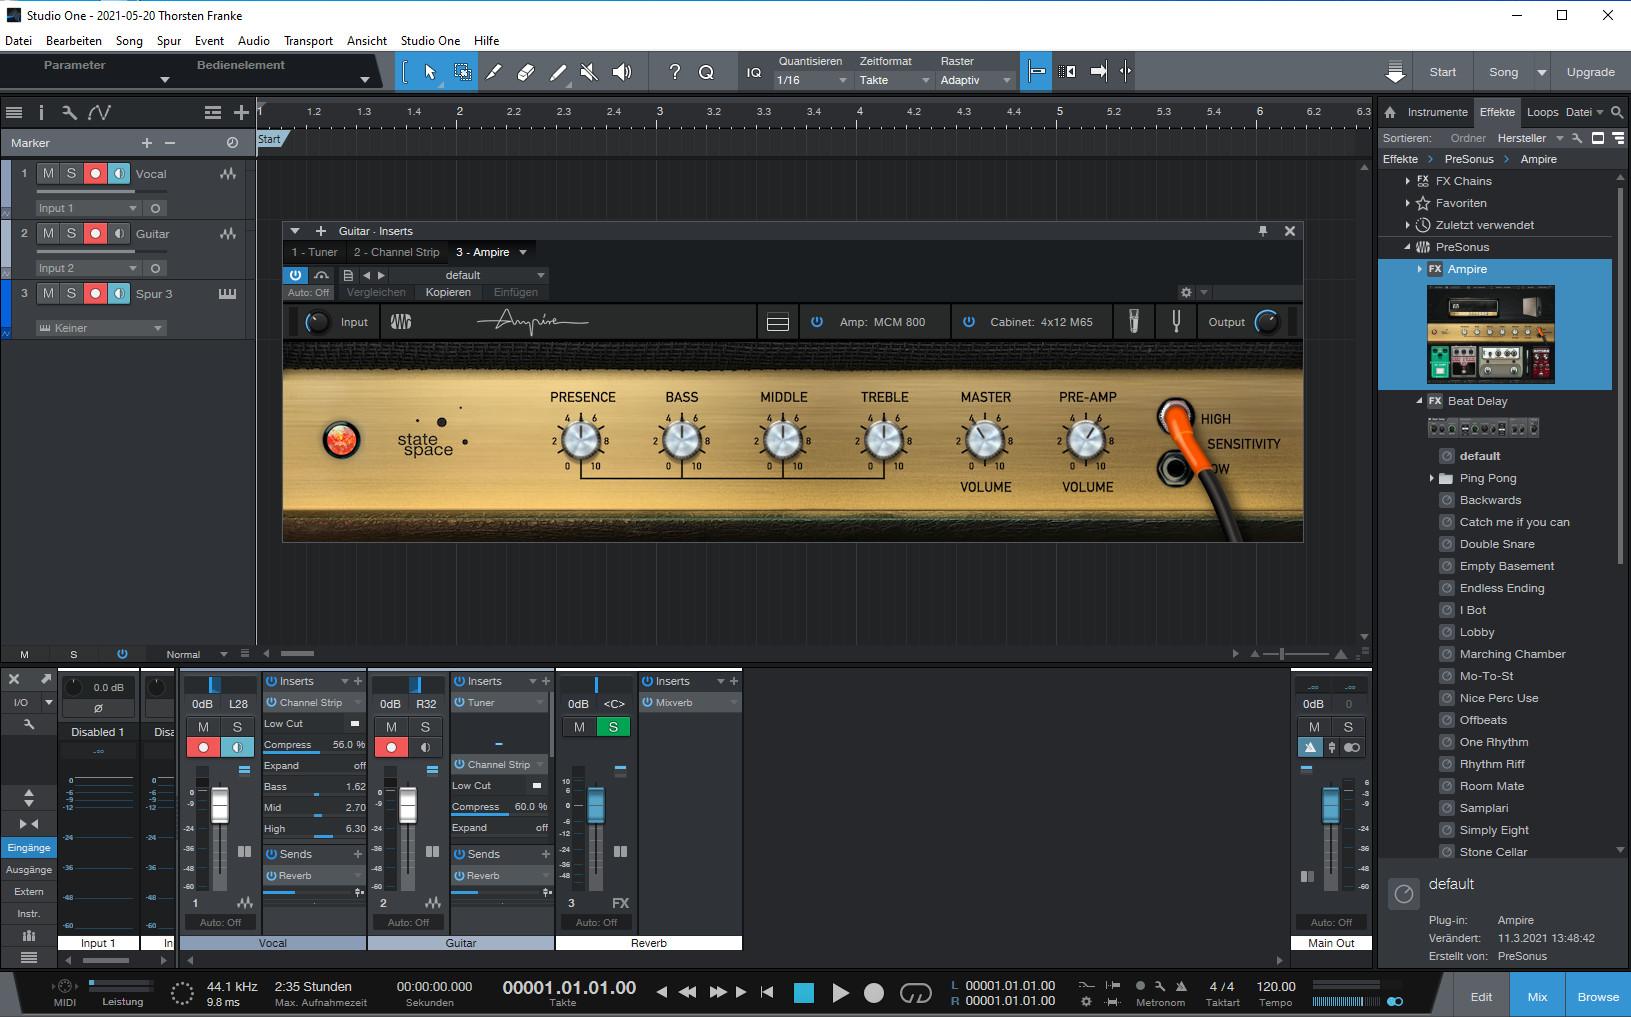 Screenshot 1 - Studio One Prime